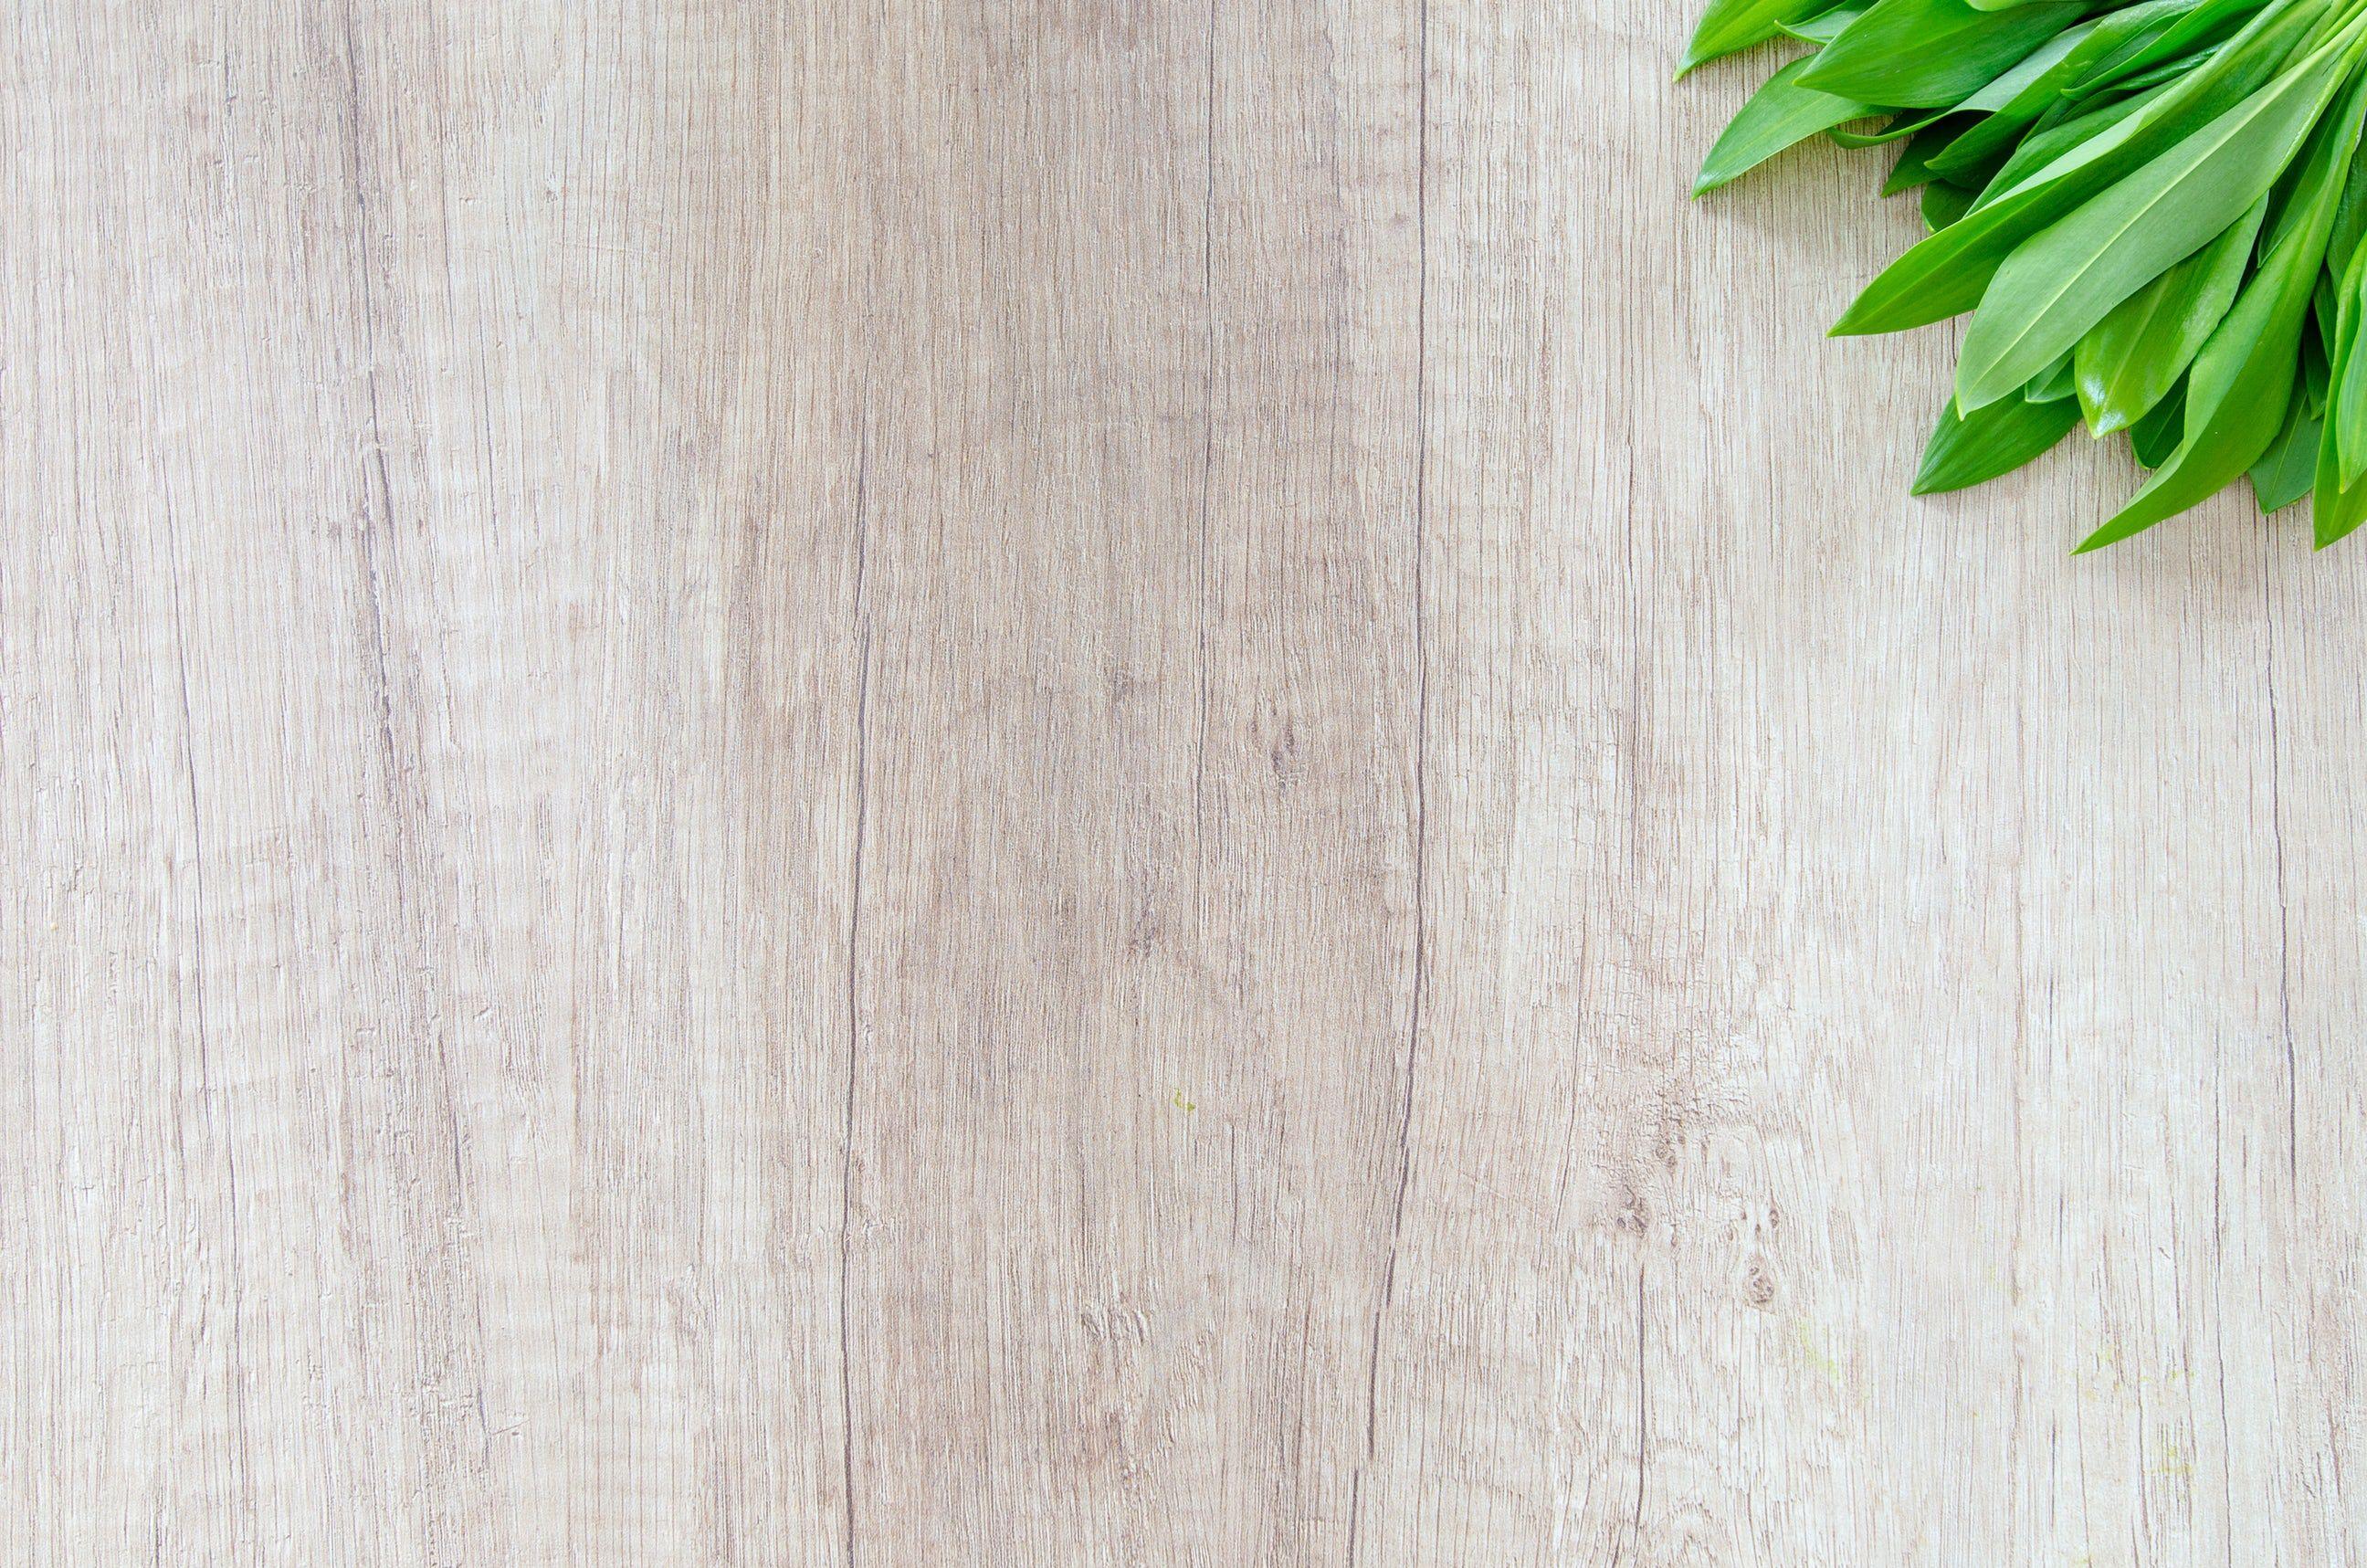 Wood Surface Photo By Michael Mroczek Michaelmroczek On Unsplash Picture On Wood Free Wood Texture Free Background Images